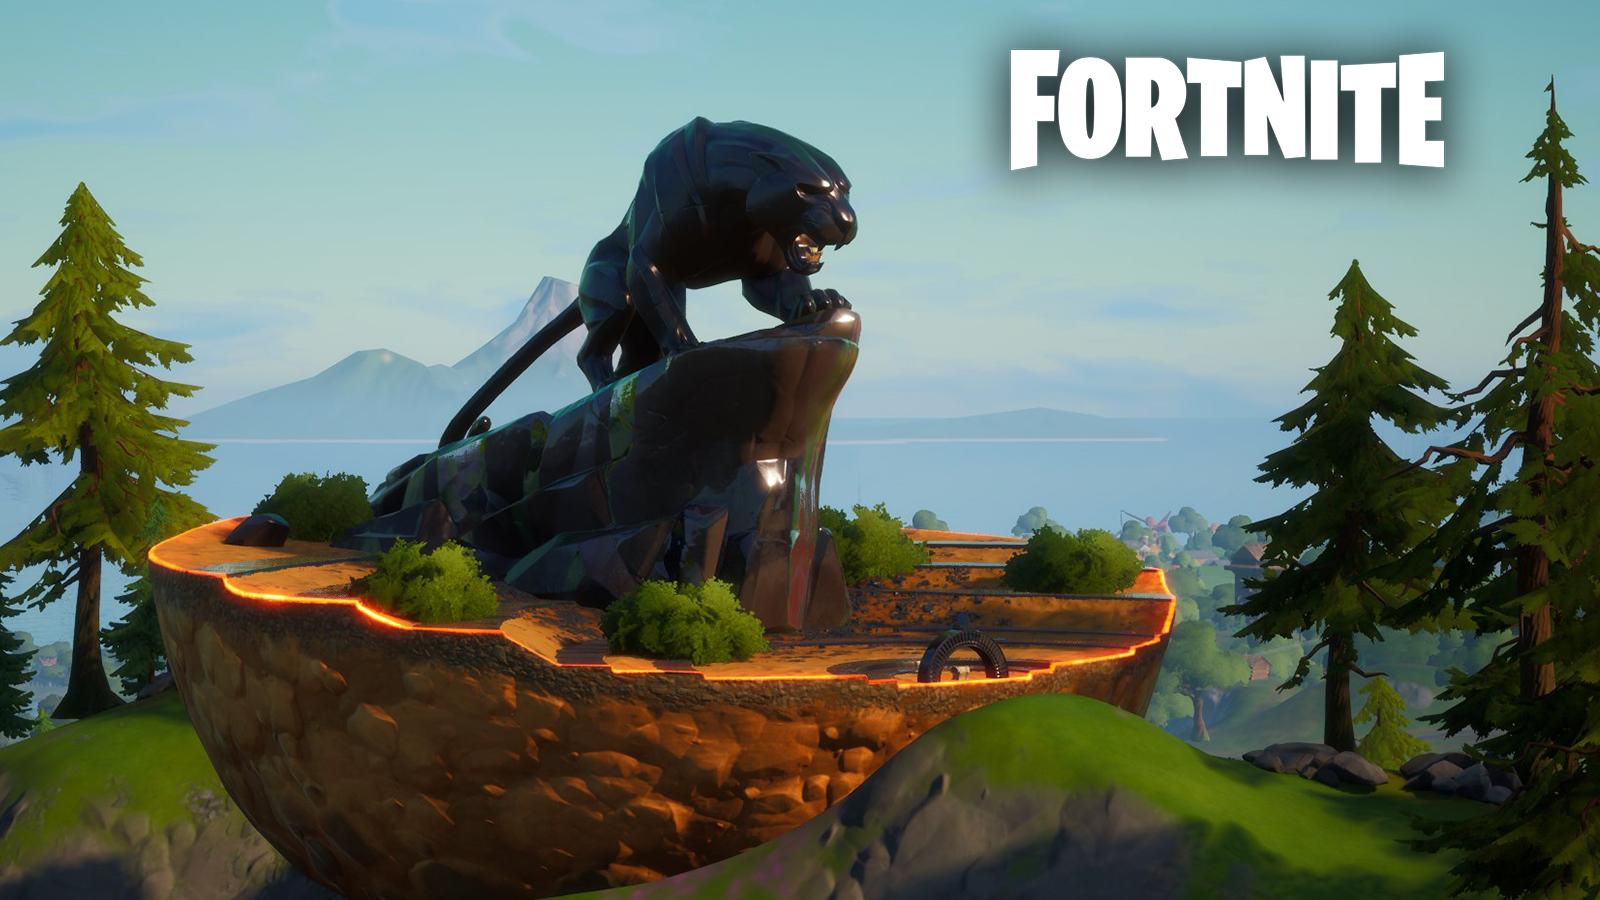 Estatua de Black Panther de Fortnite estuvo planificada